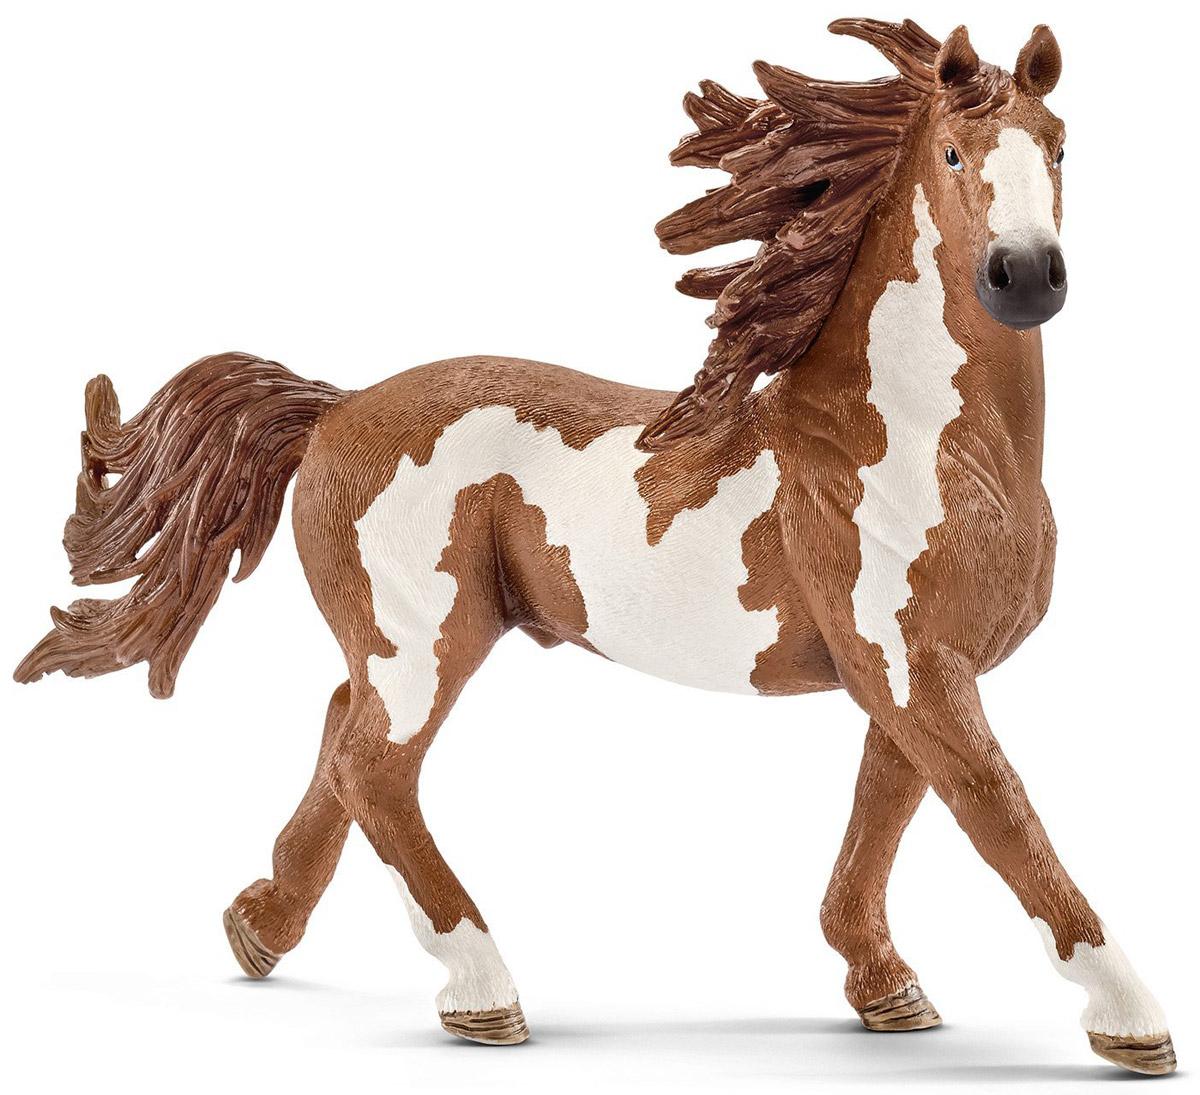 картинки фигурок лошадей породы самоед требуют